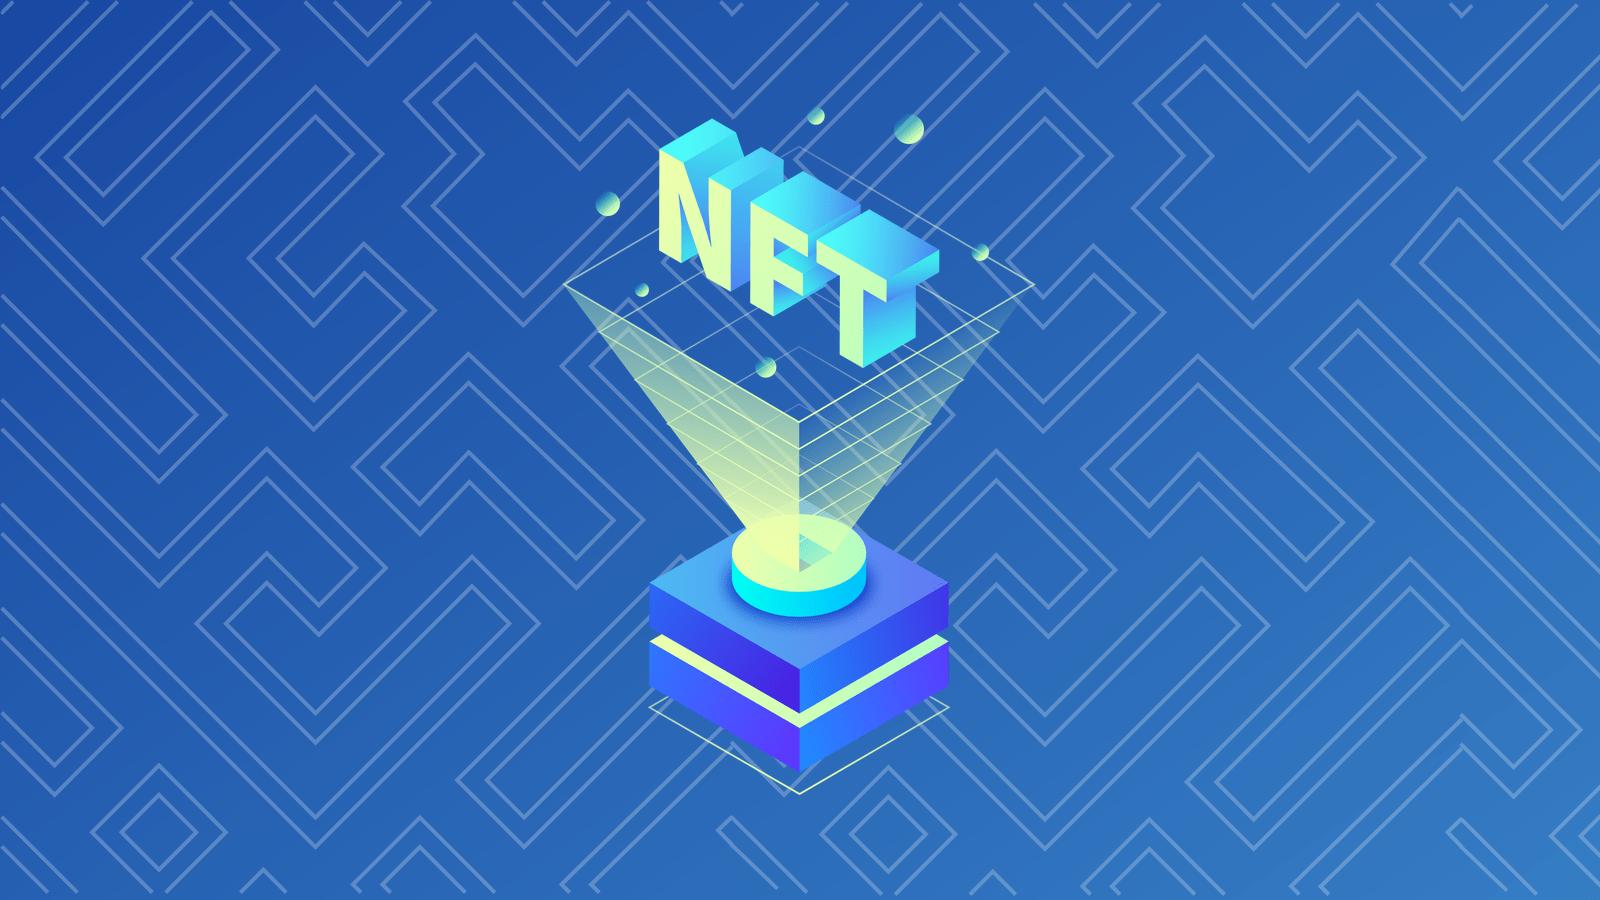 一文分析对比Axie Infinity,Gods Unchained以及Decentraland三大最受欢迎的NFT应用